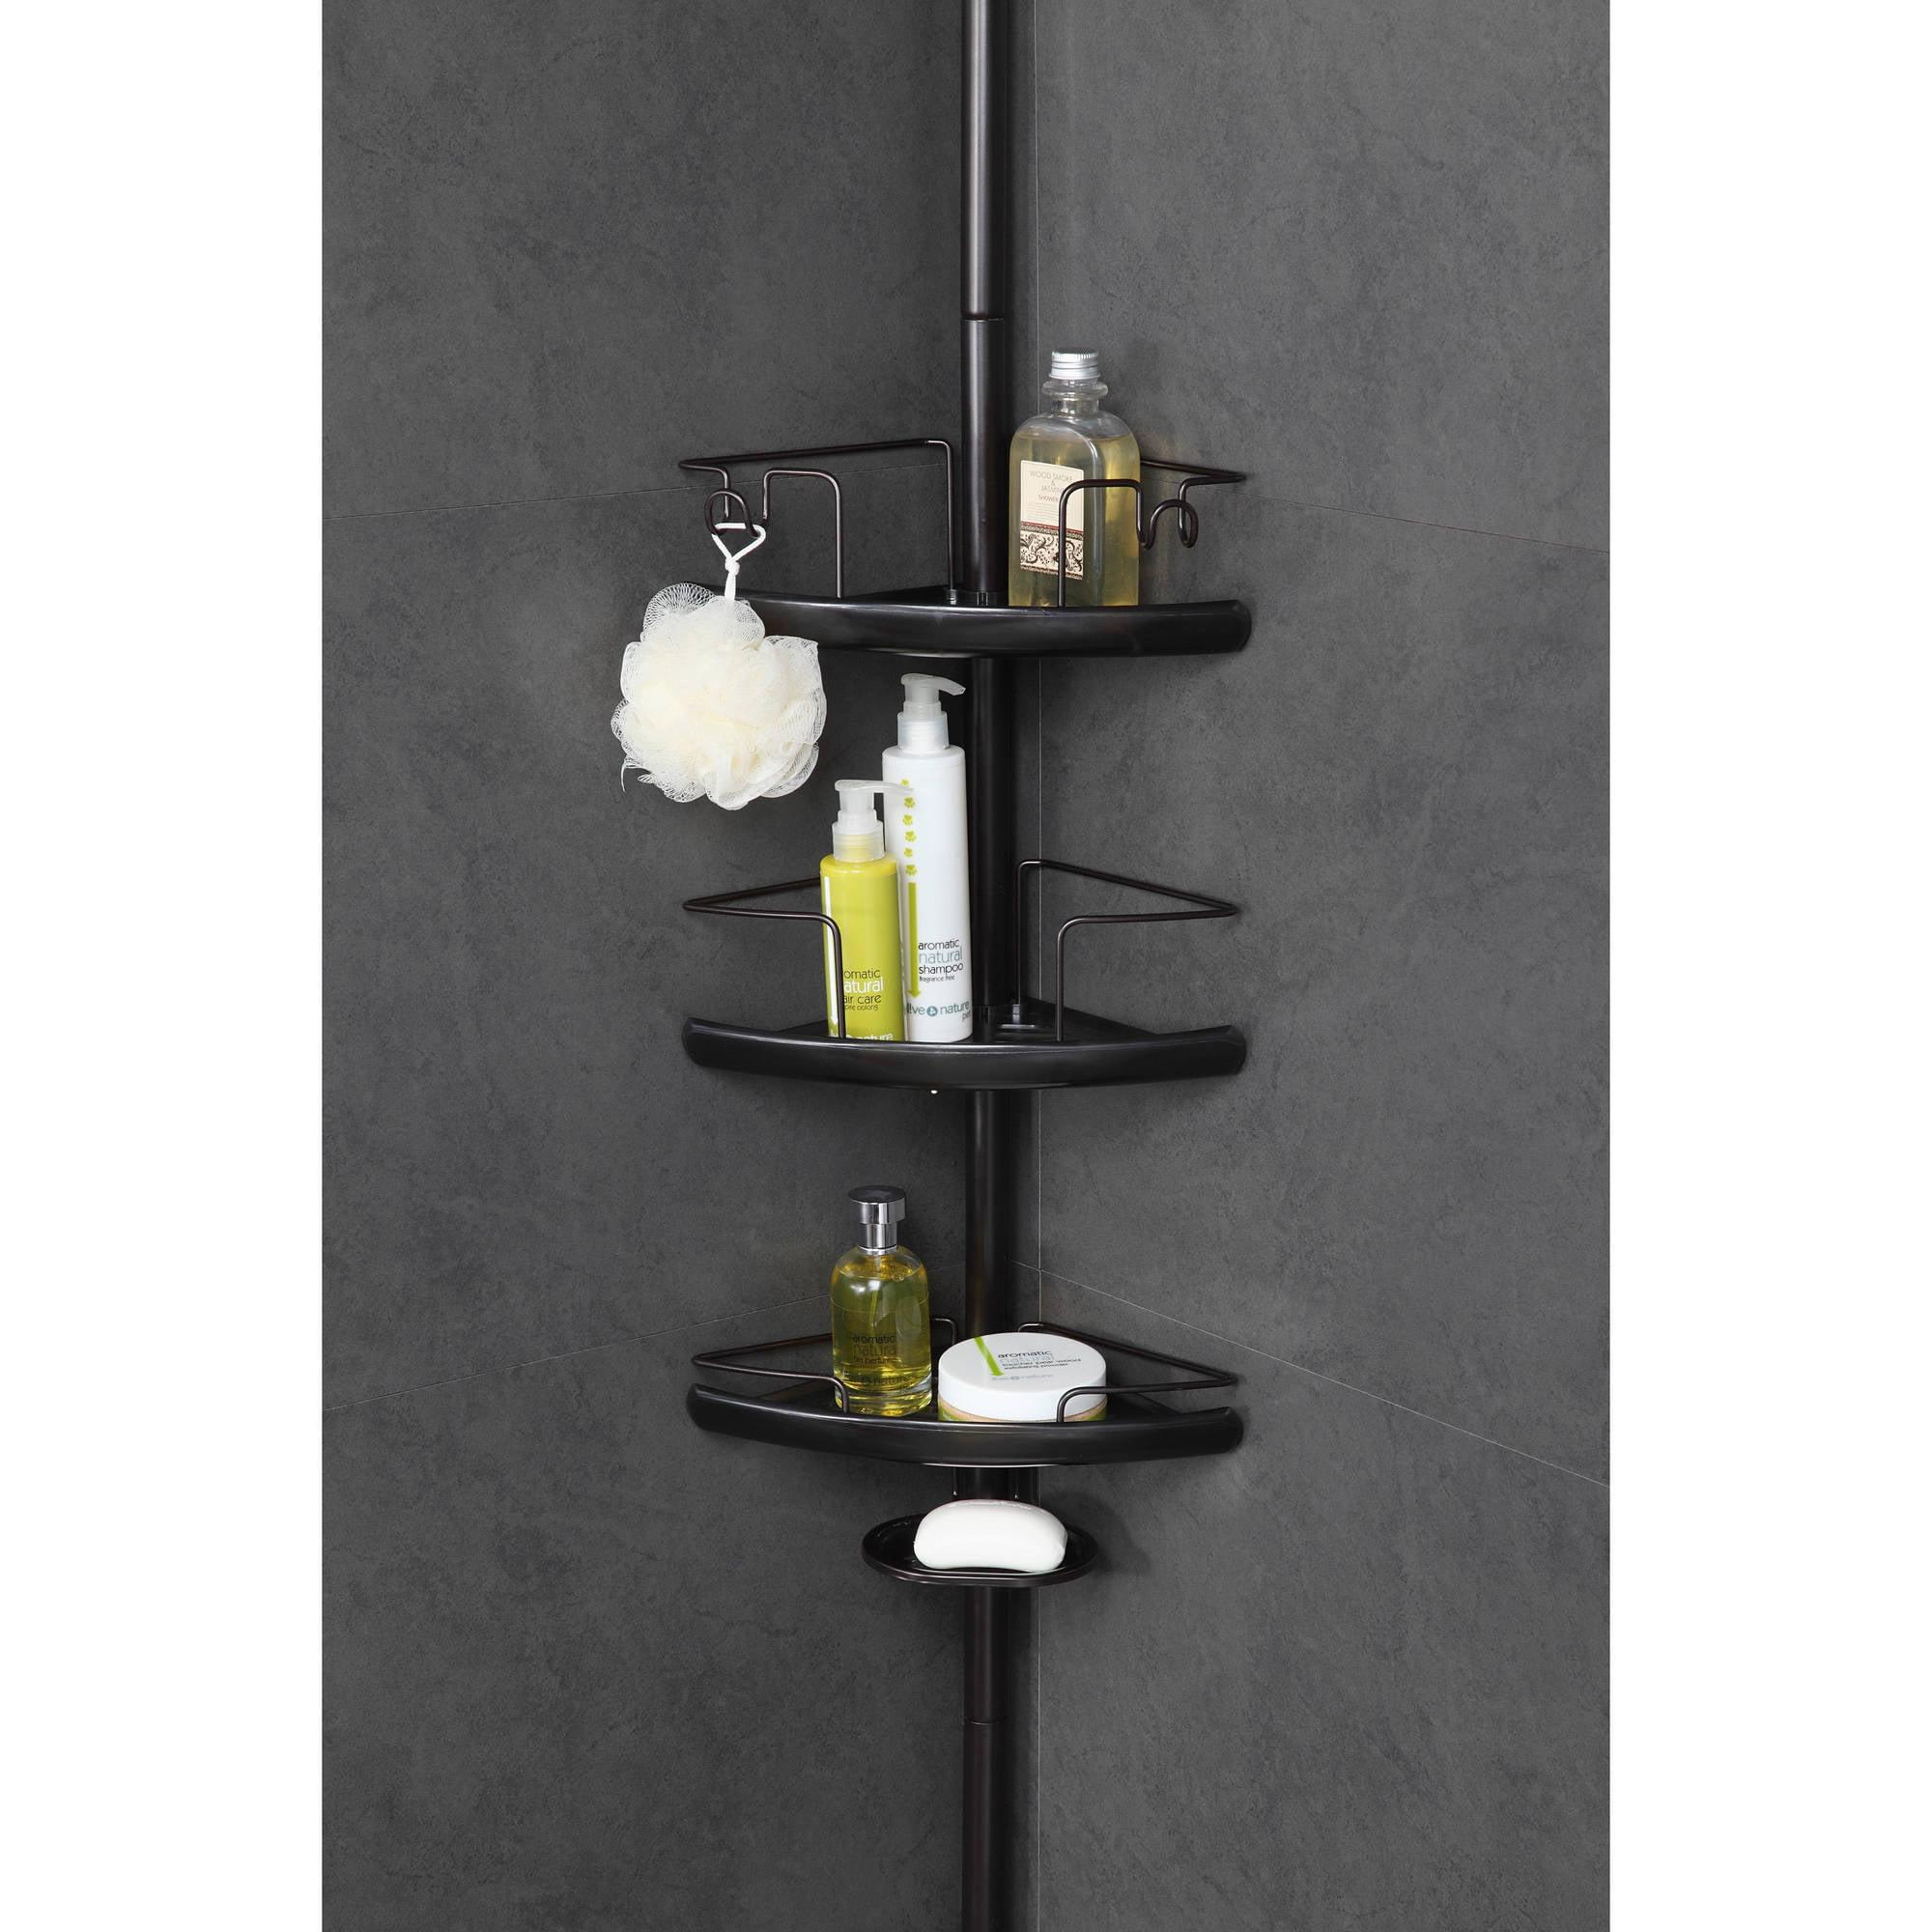 Homezone 3 Tier Adjule Pc Corner Shelf Extesion Pole Caddy Oil Rubbed Bronze